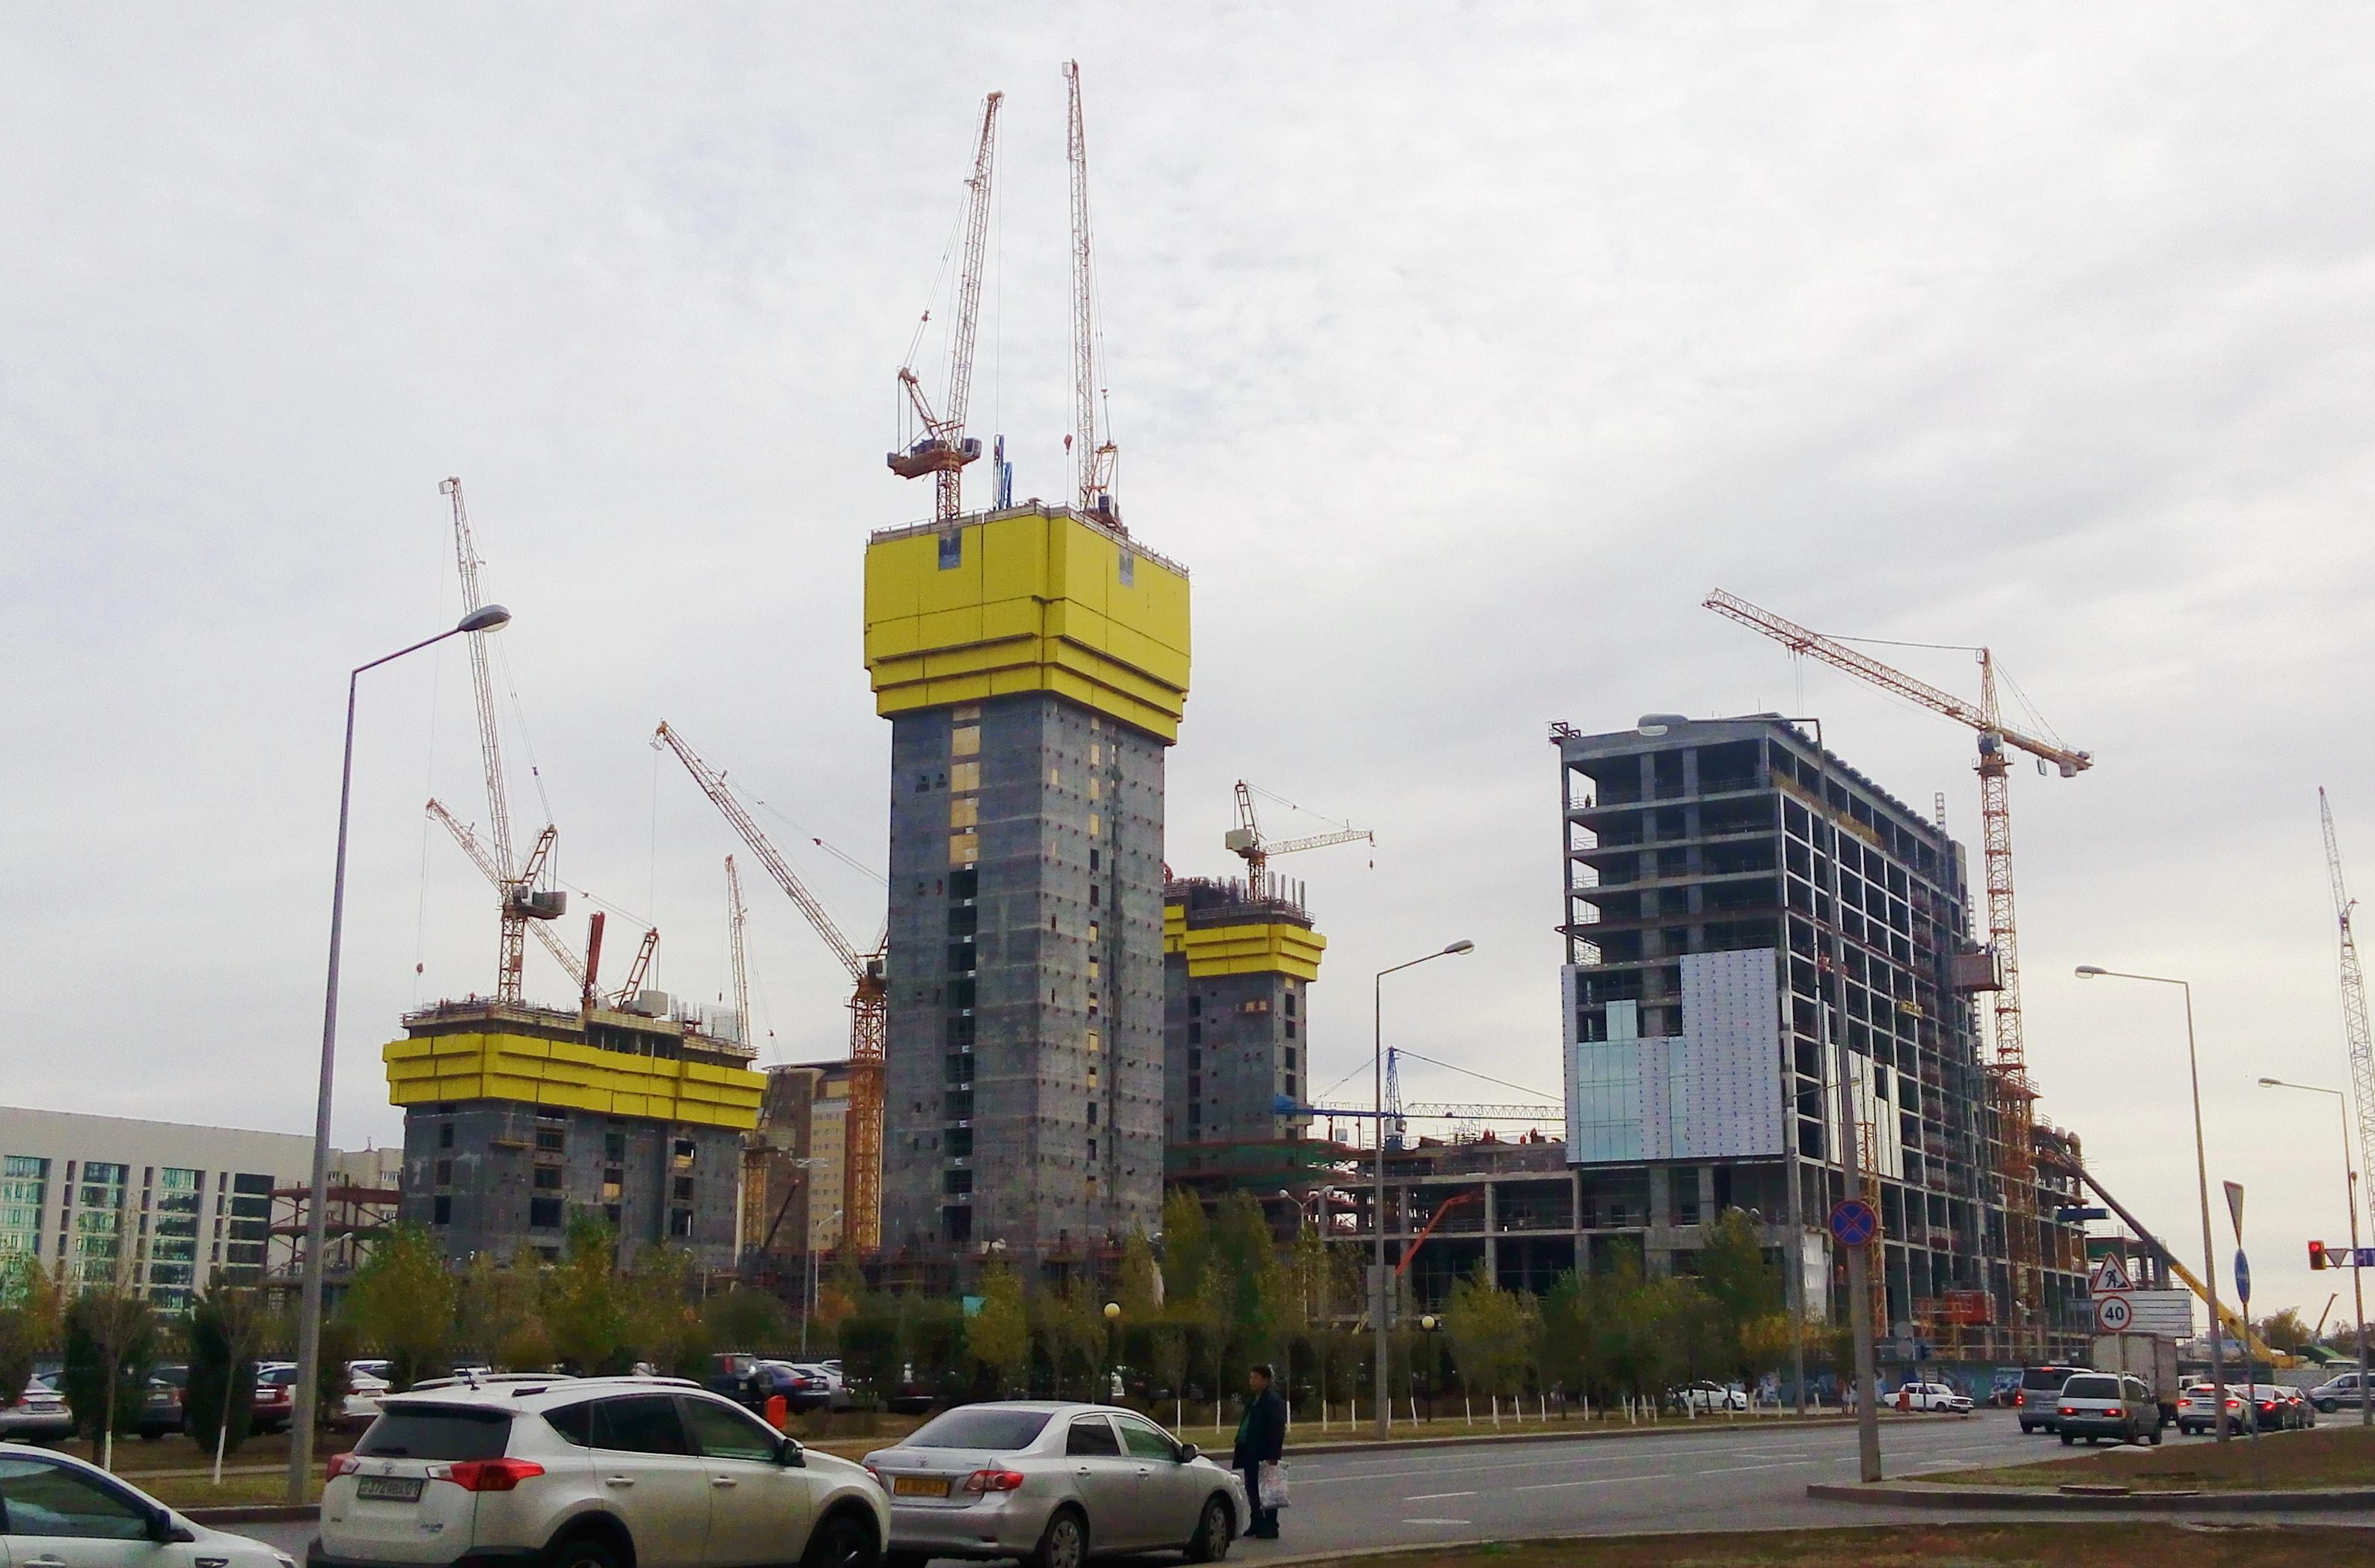 Abu Dhabi Plaza Noursoultan Astana Capitale Kazakhstan 2015 Chantier Construction